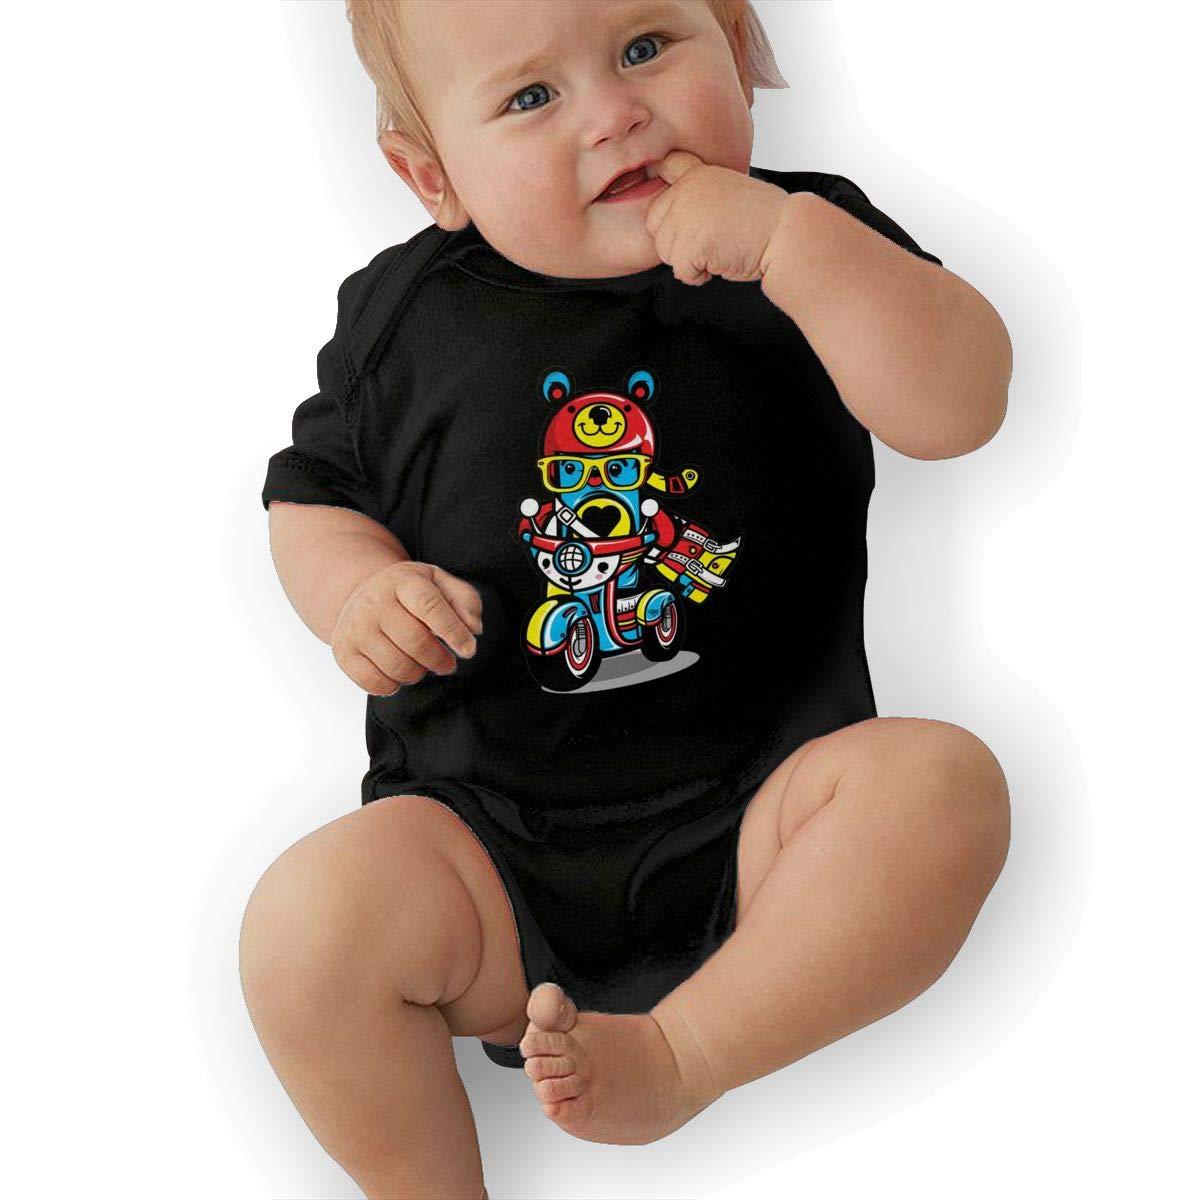 Dfenere ChocoToy Retro Newborn Baby Short Sleeve Bodysuit Romper Infant Summer Clothing